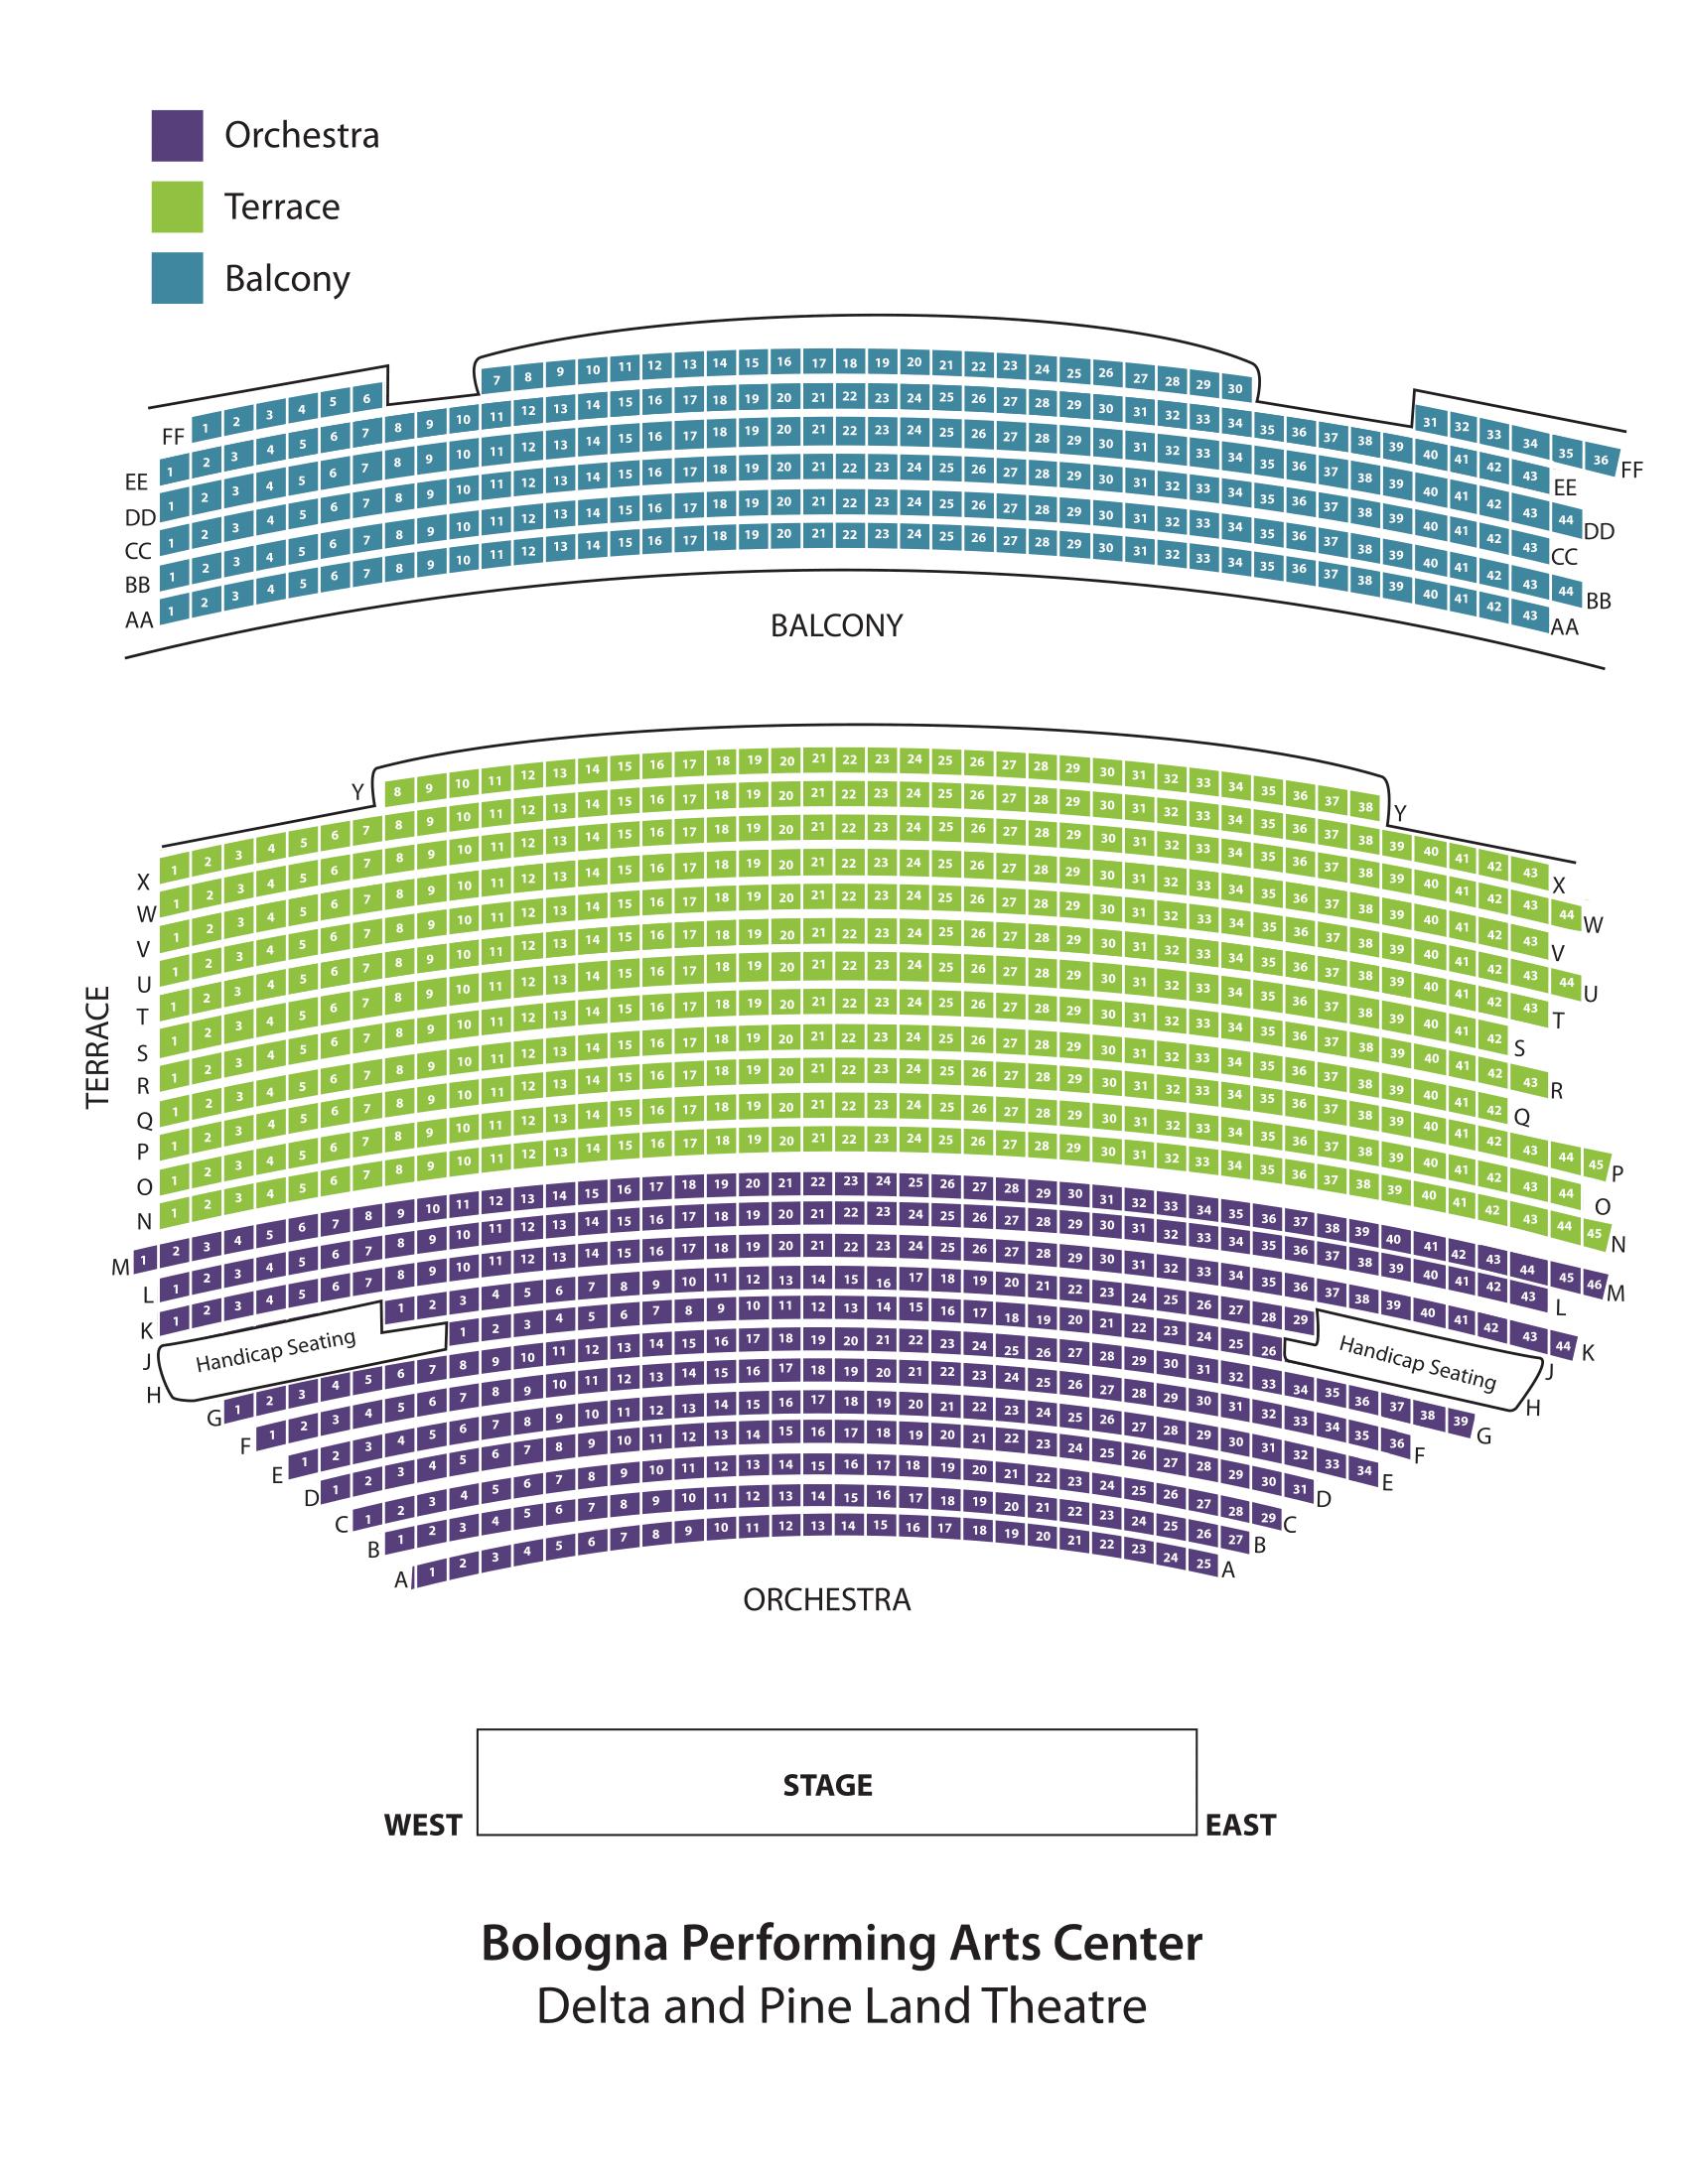 2017 BPAC Seating Chart-1